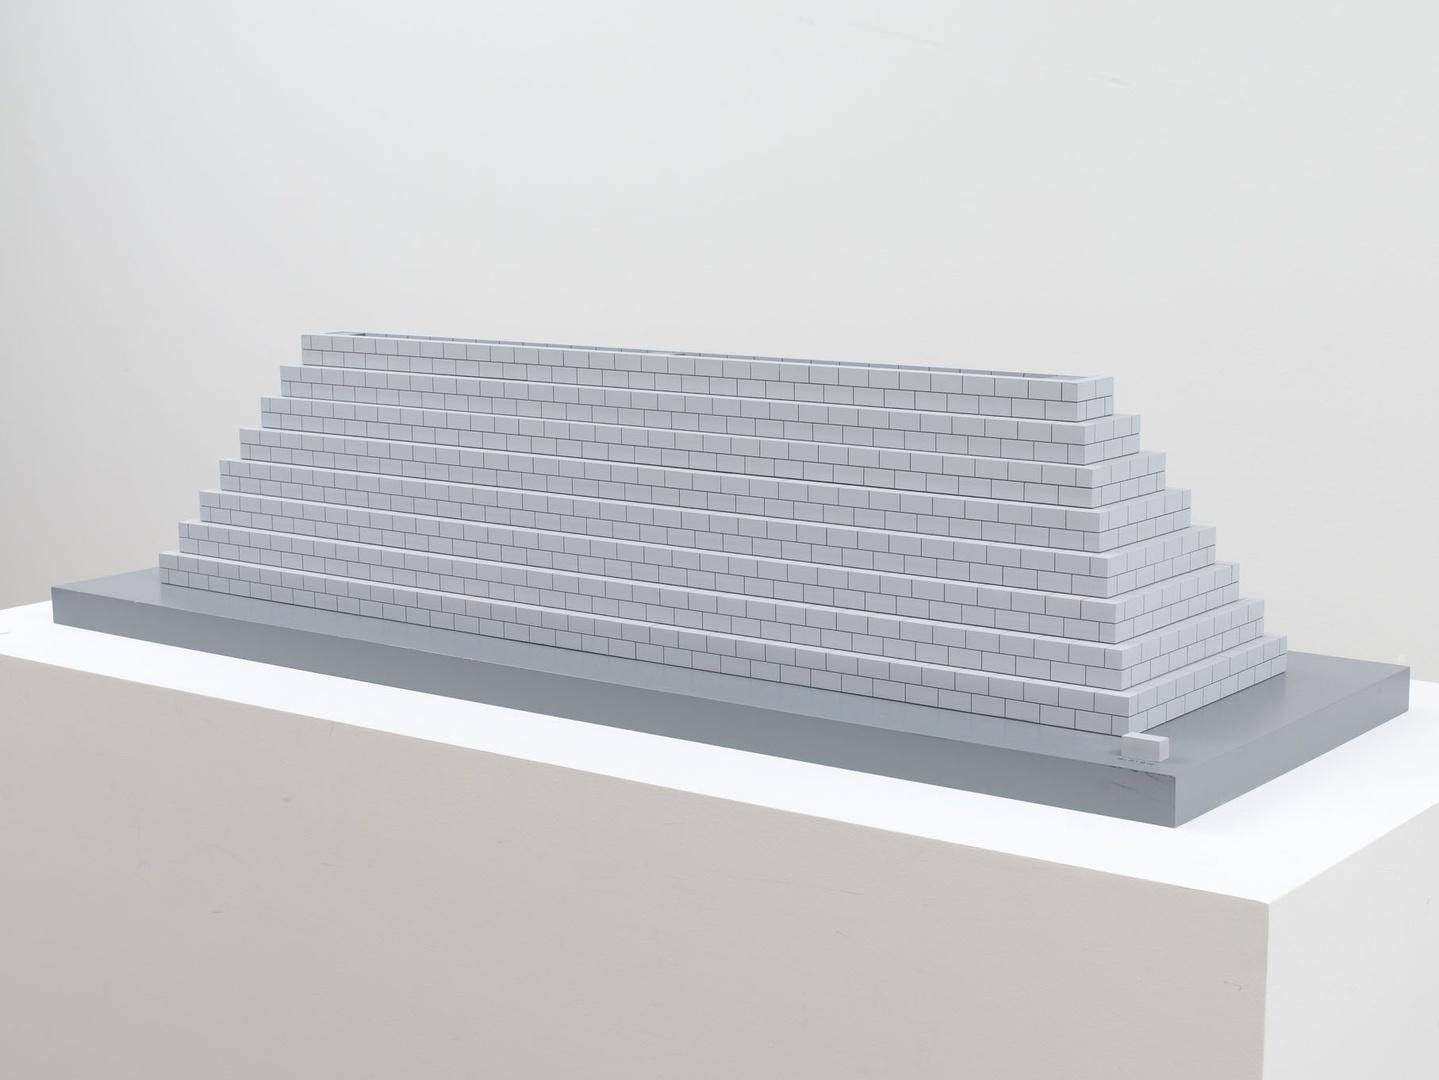 Ontwerp voor Long Pyramid